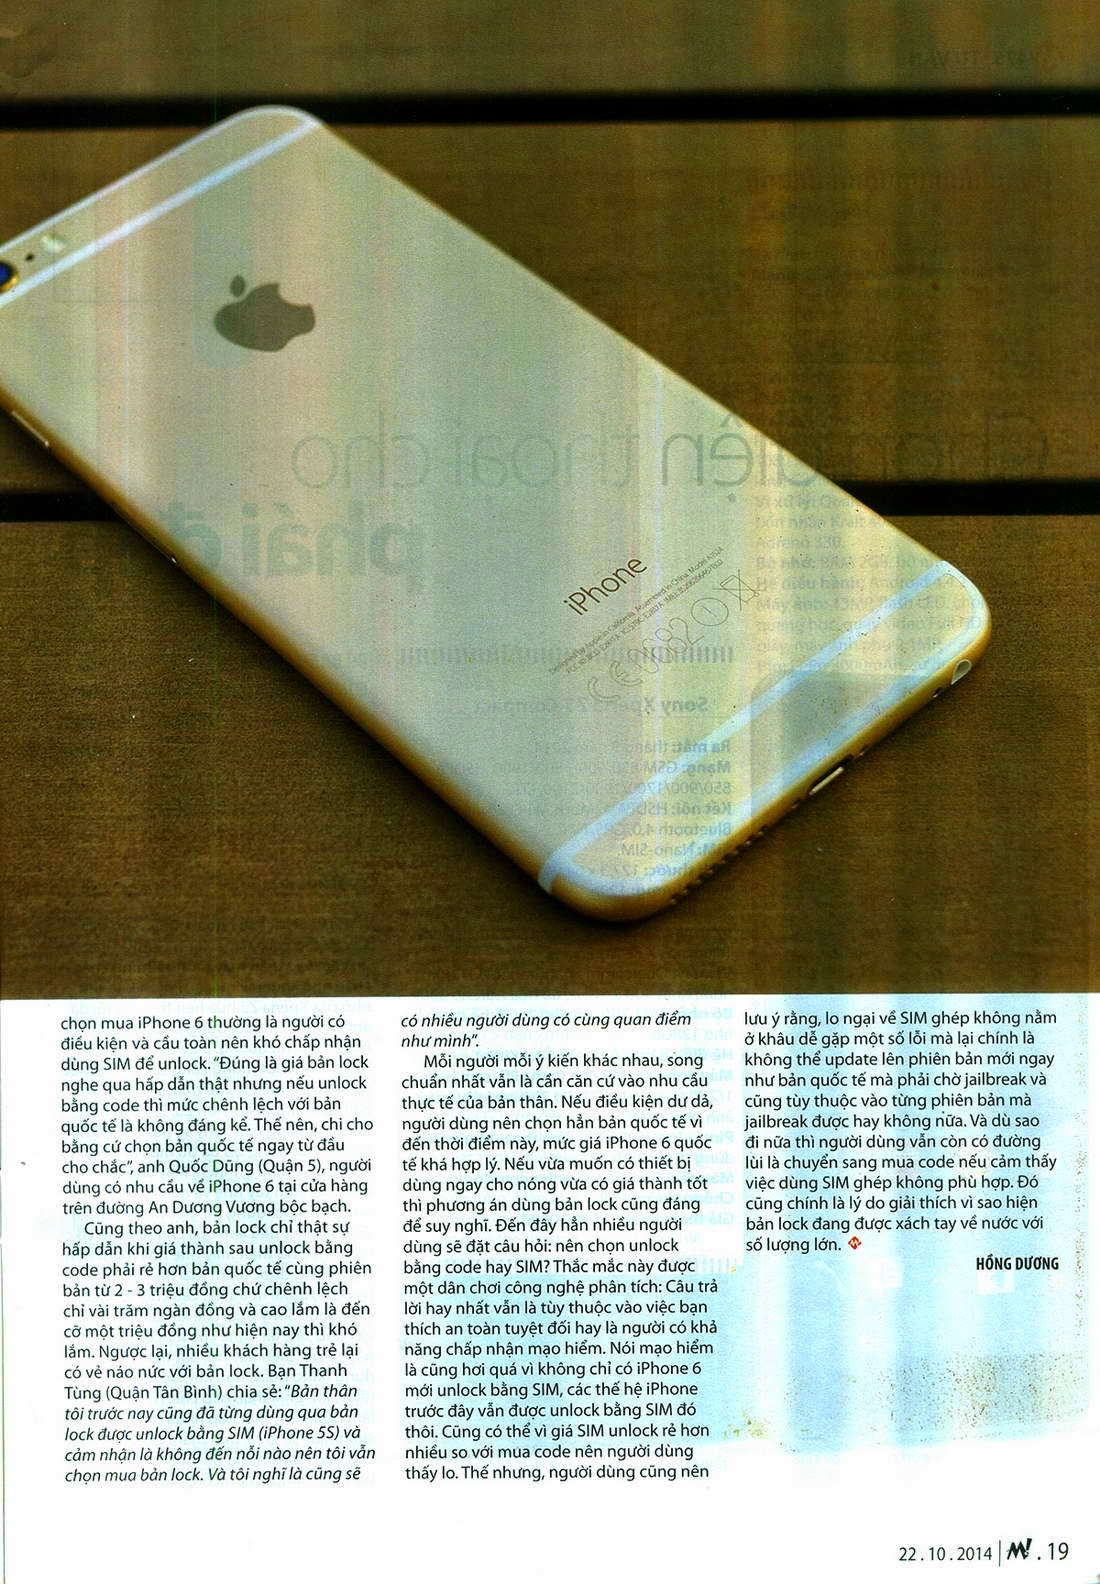 EChip Mobile 475 tapchicntt.com